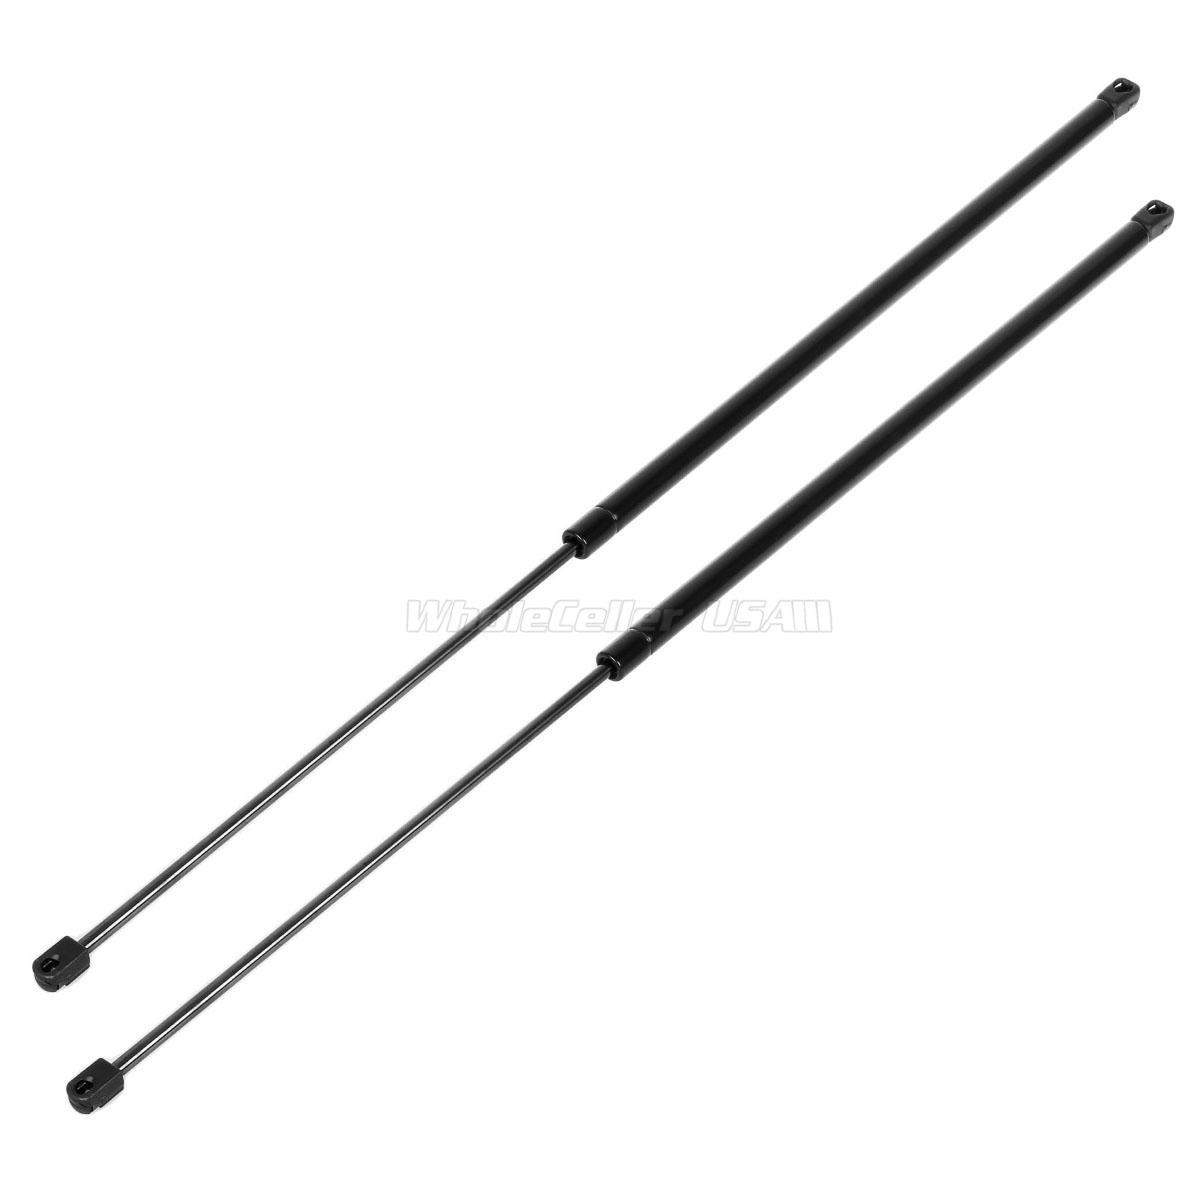 qt2 front hood lift support shocks struts for cadillac